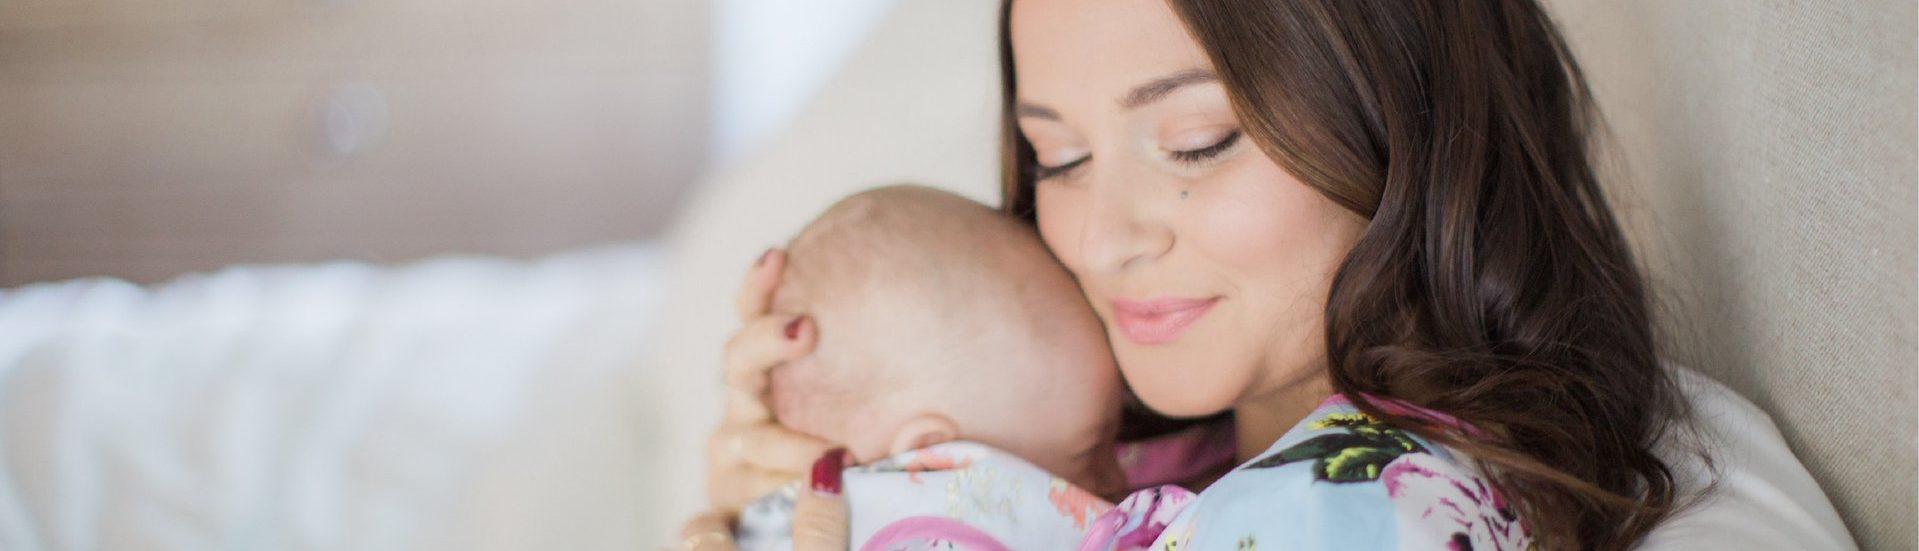 Claim Your Fertility Retreat